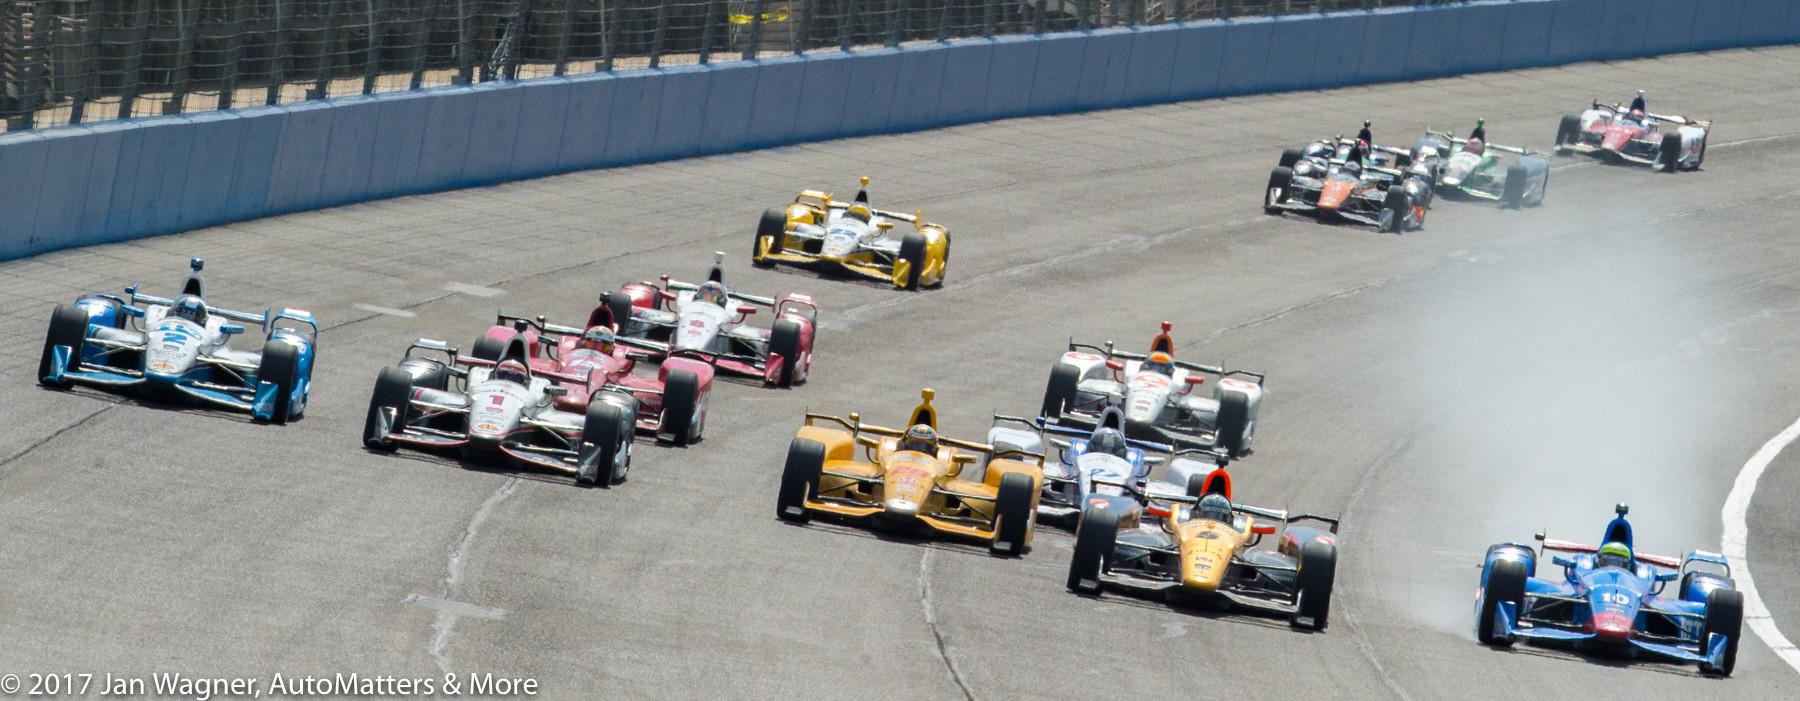 5-wide IndyCar racing (2015 MAV TV 500)